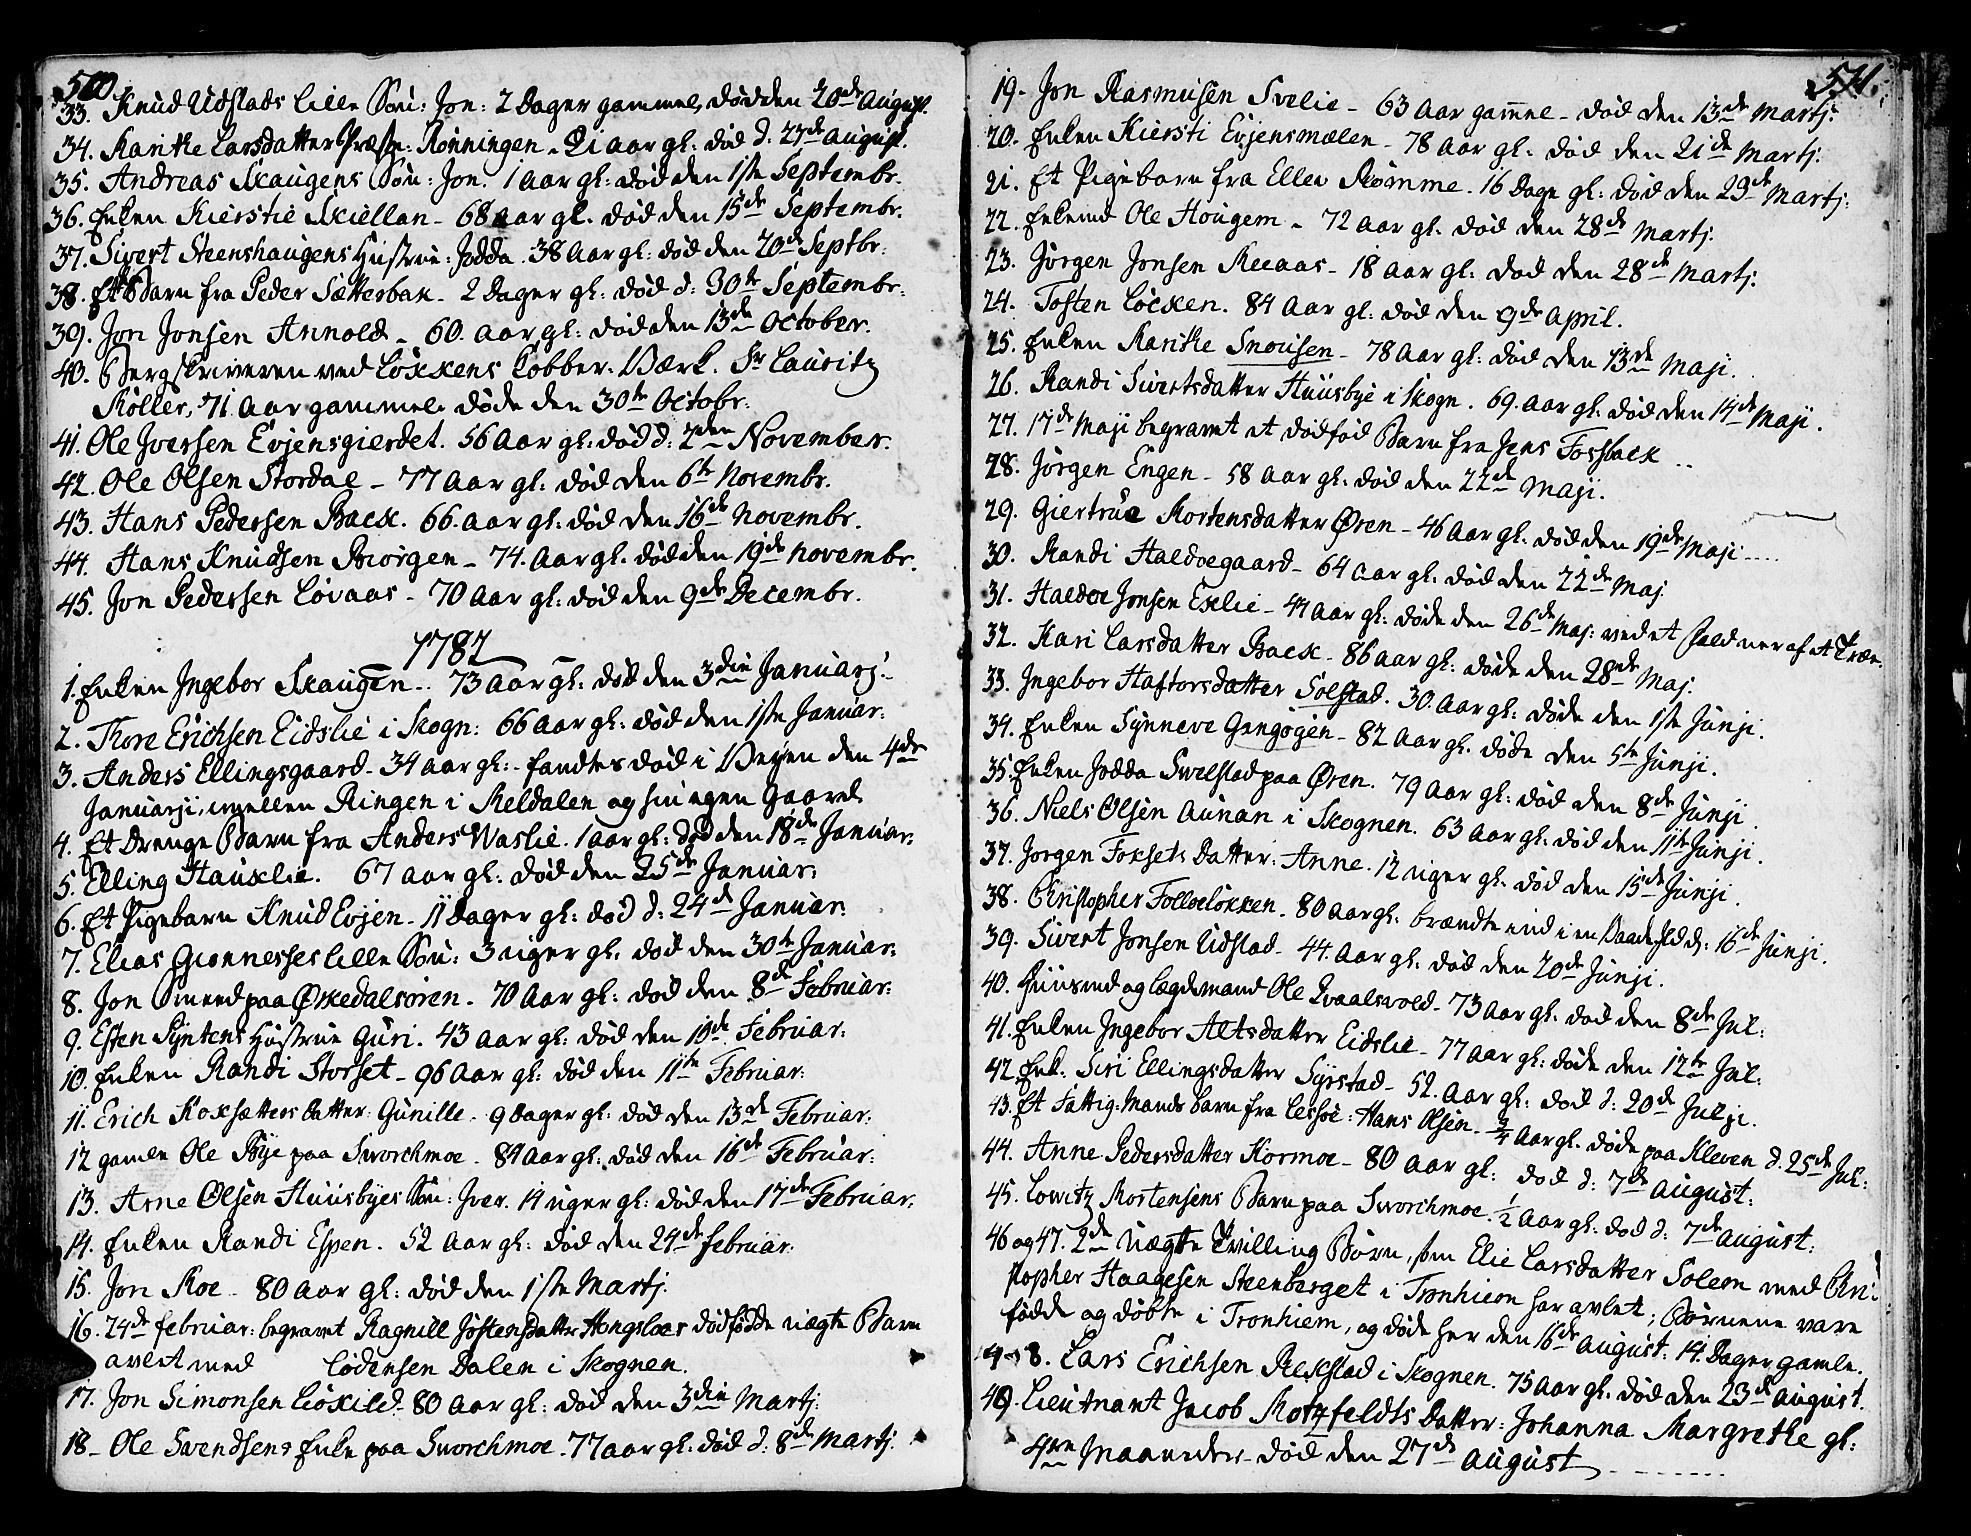 SAT, Ministerialprotokoller, klokkerbøker og fødselsregistre - Sør-Trøndelag, 668/L0802: Parish register (official) no. 668A02, 1776-1799, p. 510-511